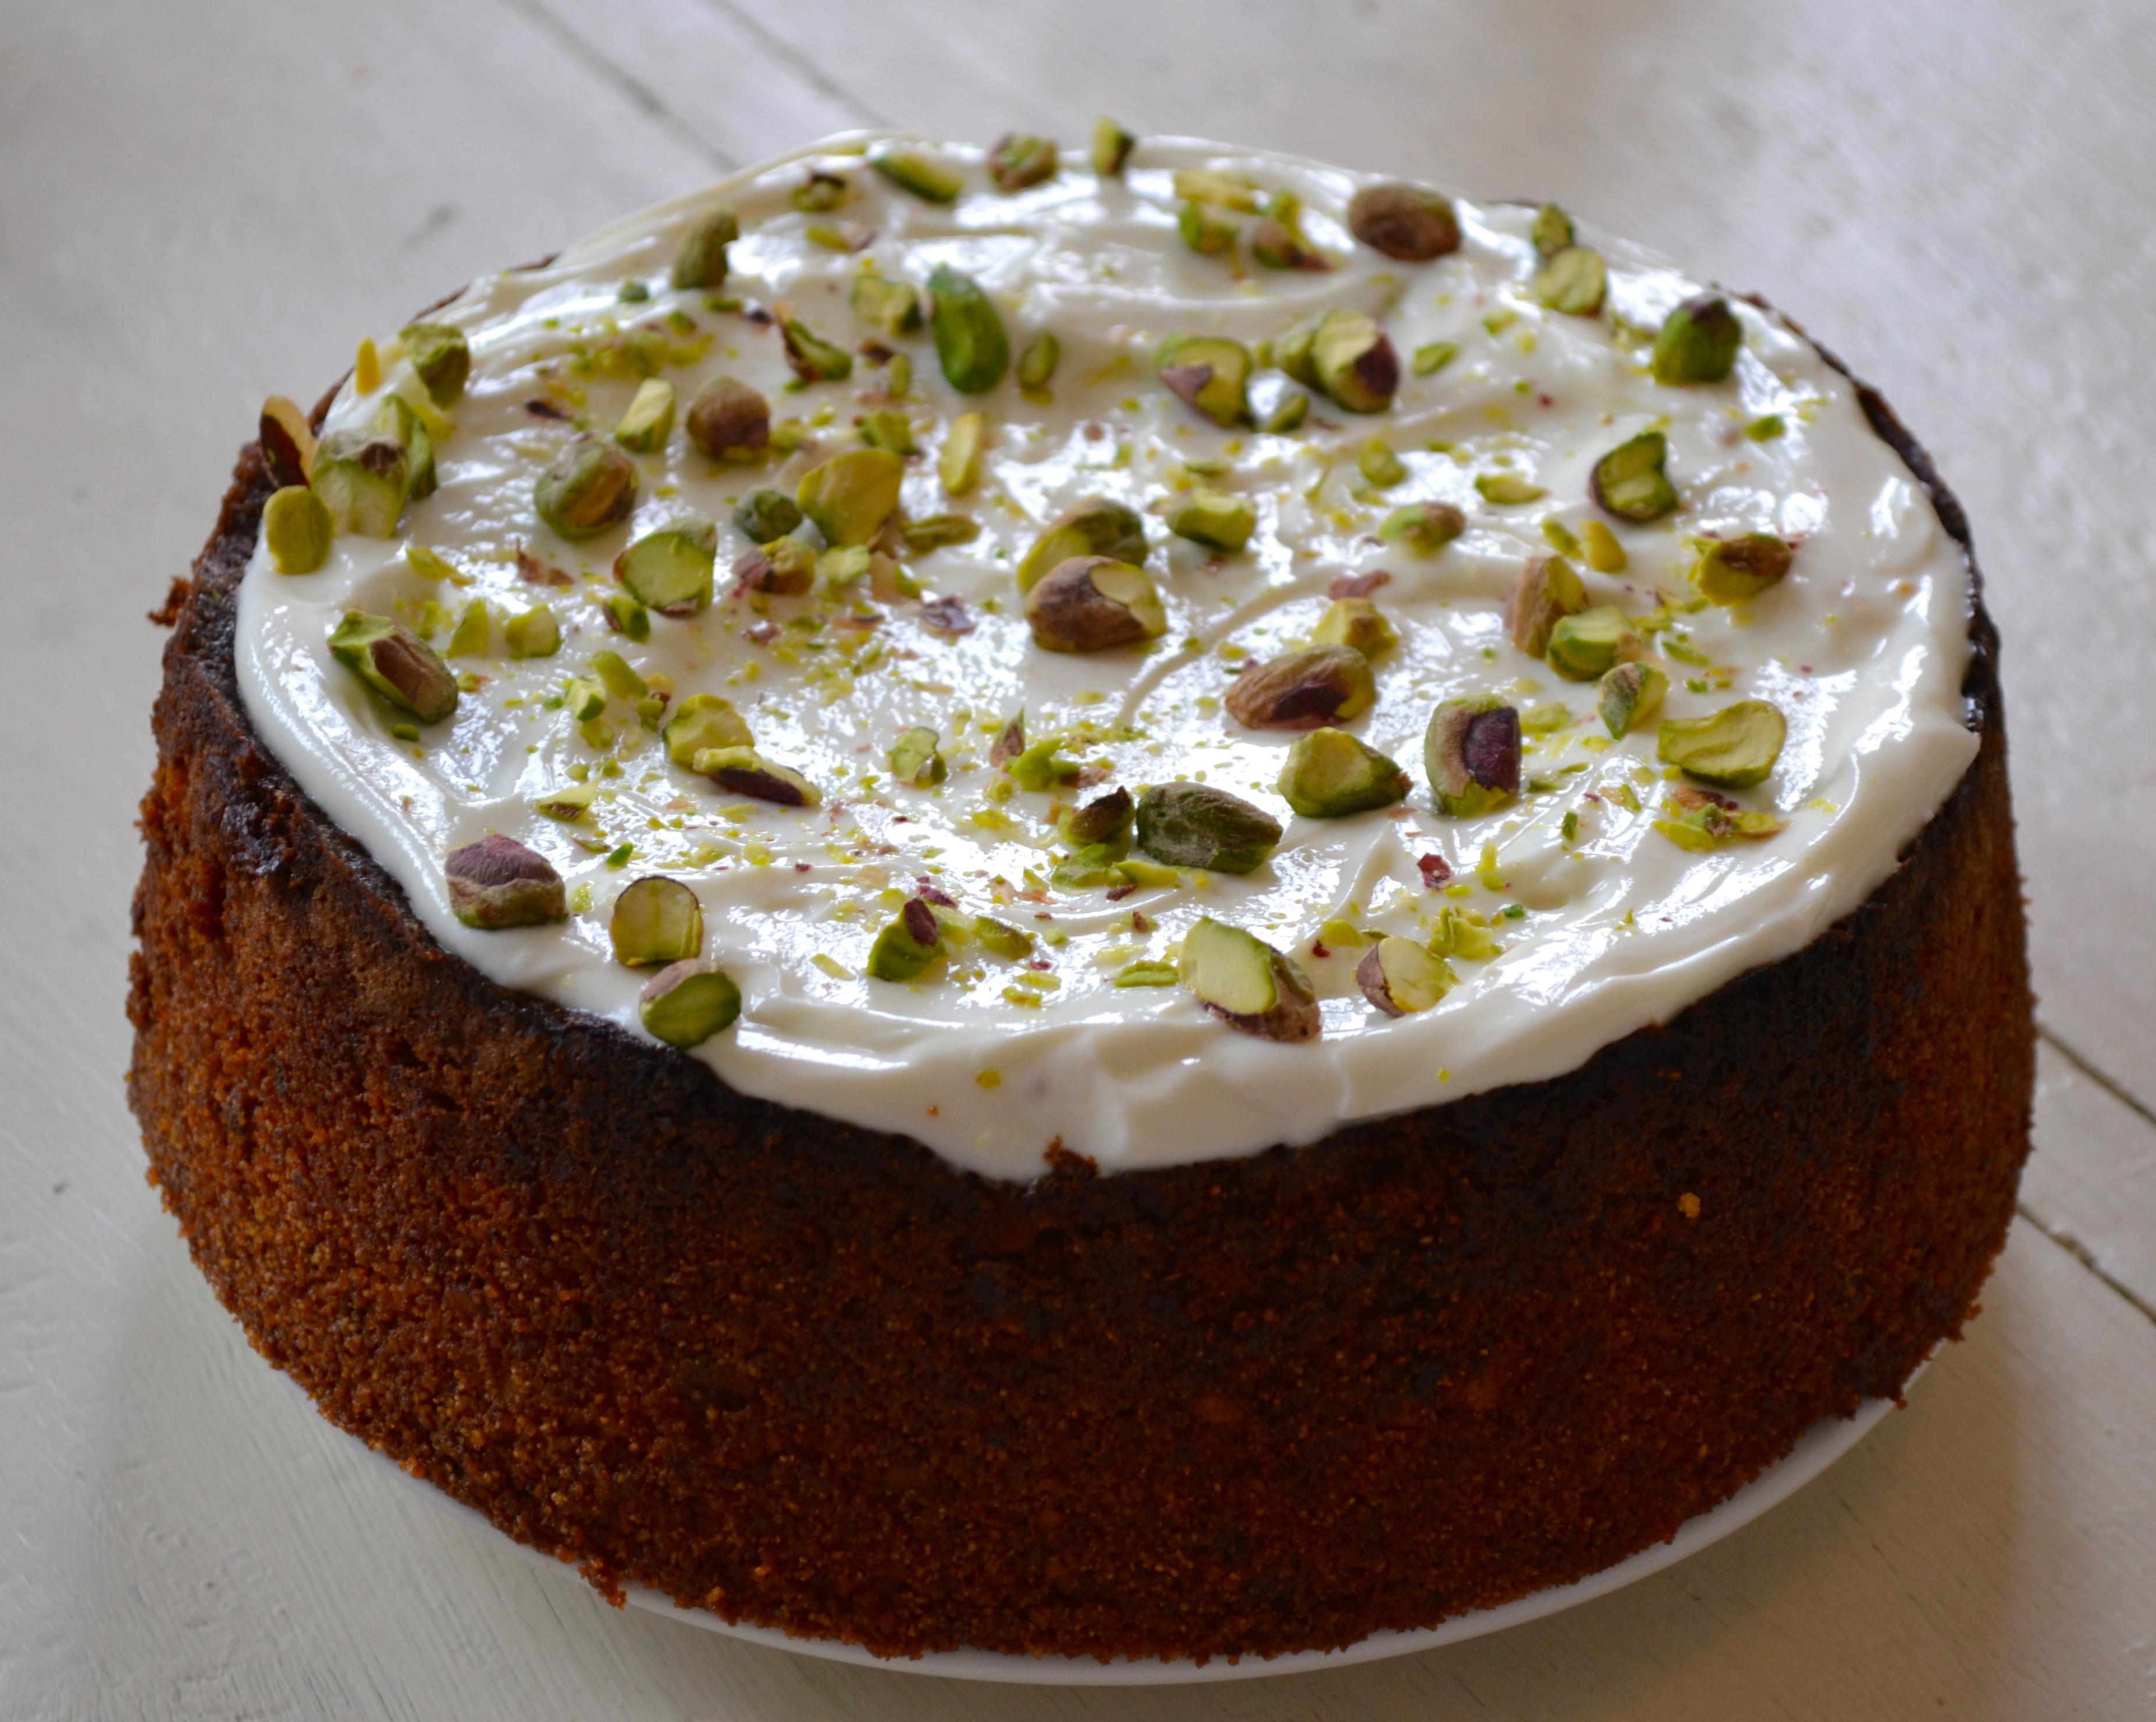 Jamie Oliver Lemon Yogurt Cake Recipe: Pistachio, Yoghurt & Elderflower Cake